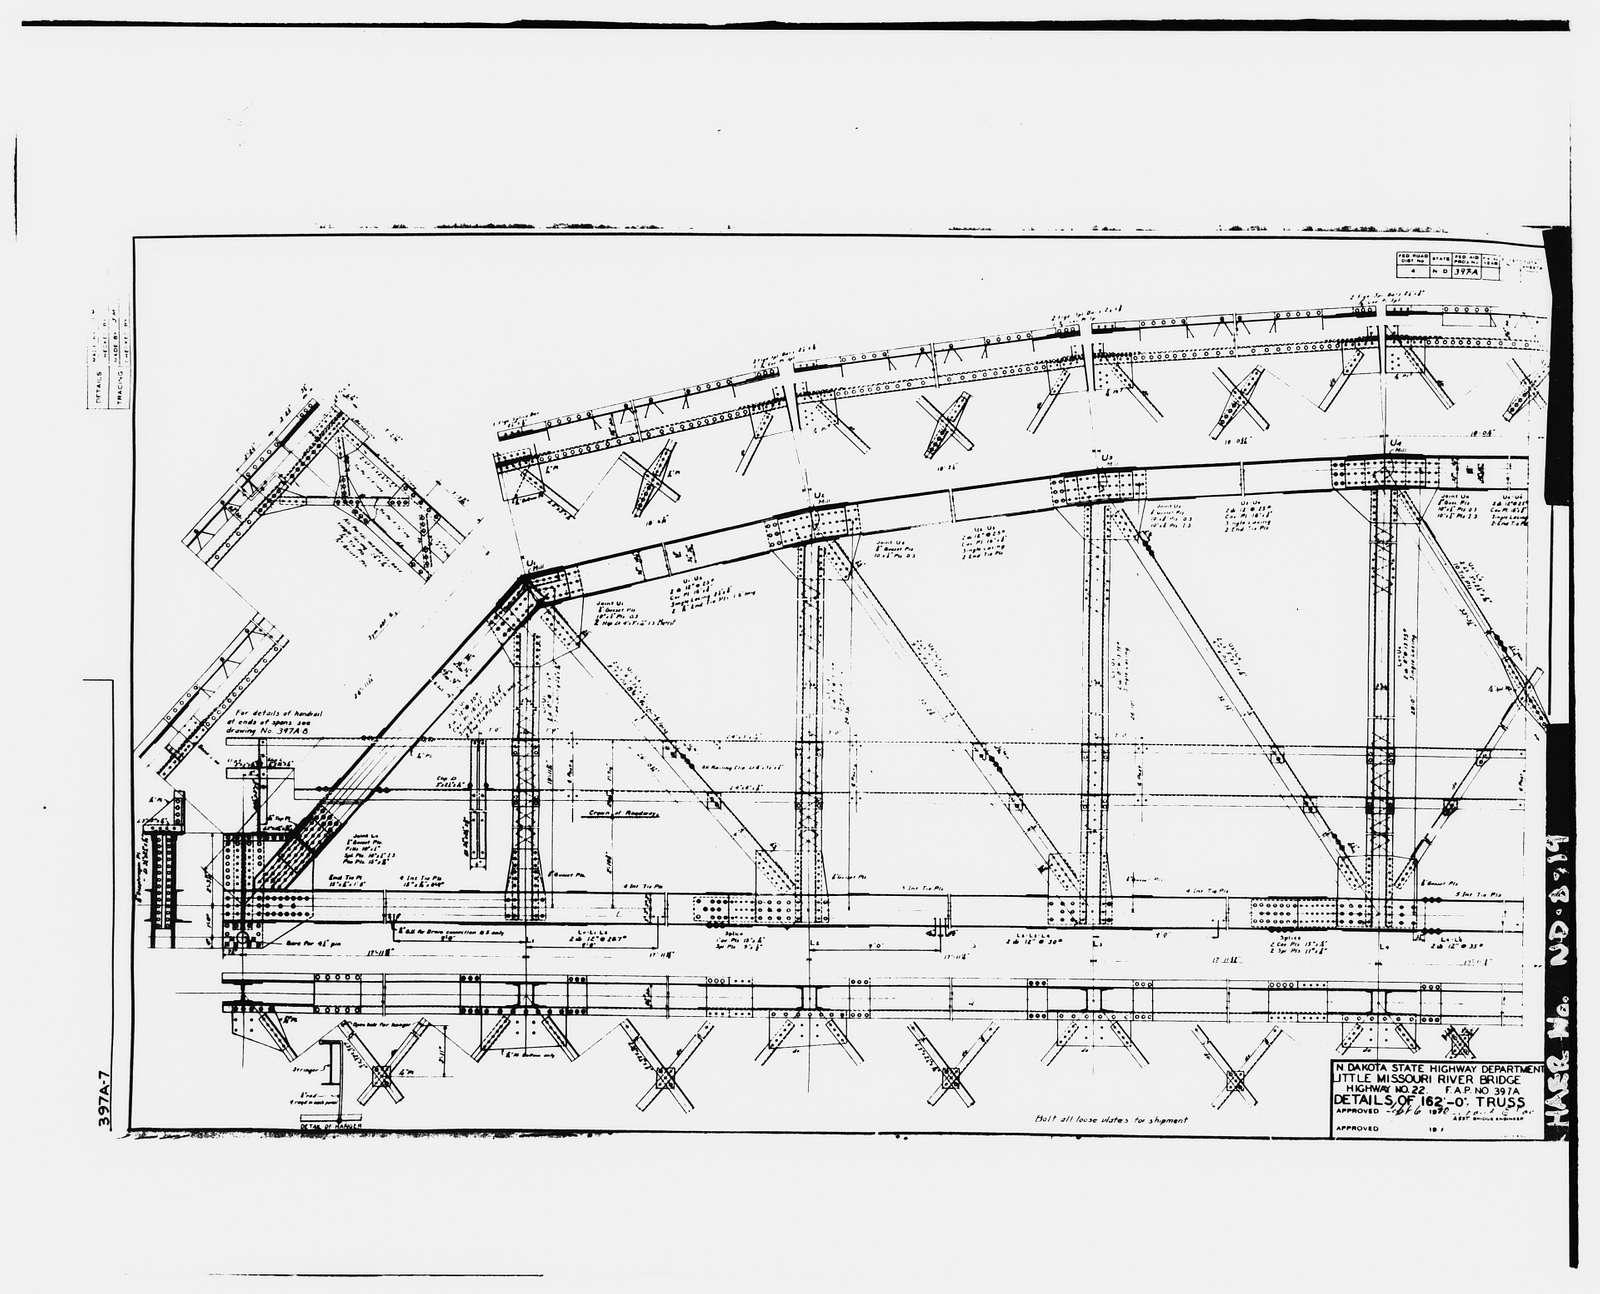 Lost Bridge, Spanning Little Missouri River, twenty-three miles north of Killdeer, ND, on State Highway No. 22, Killdeer, Dunn County, ND